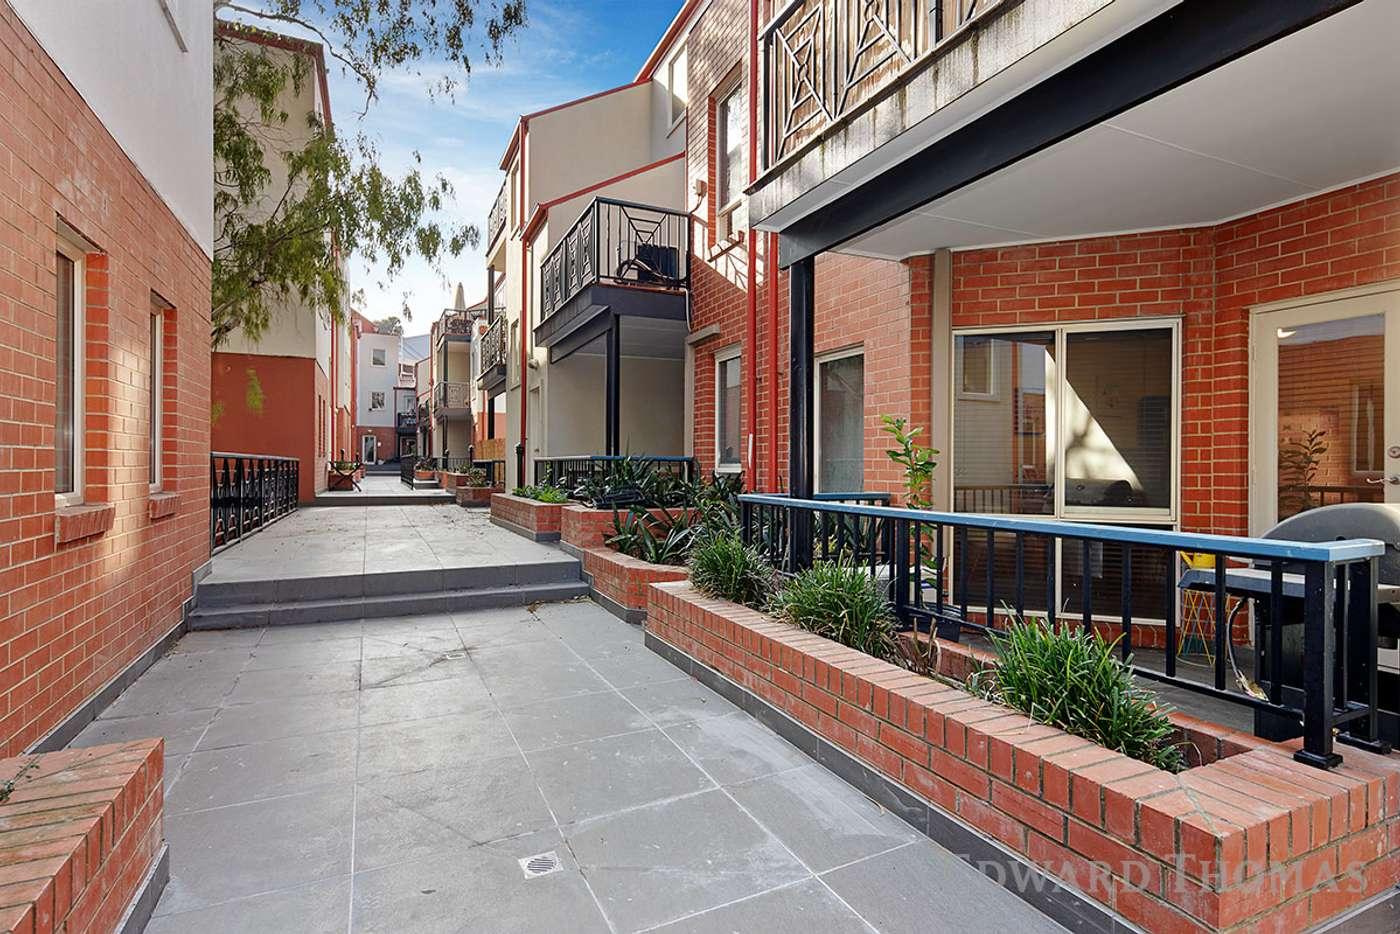 Main view of Homely apartment listing, 12/8 - 32 Howlett Street, Kensington VIC 3031